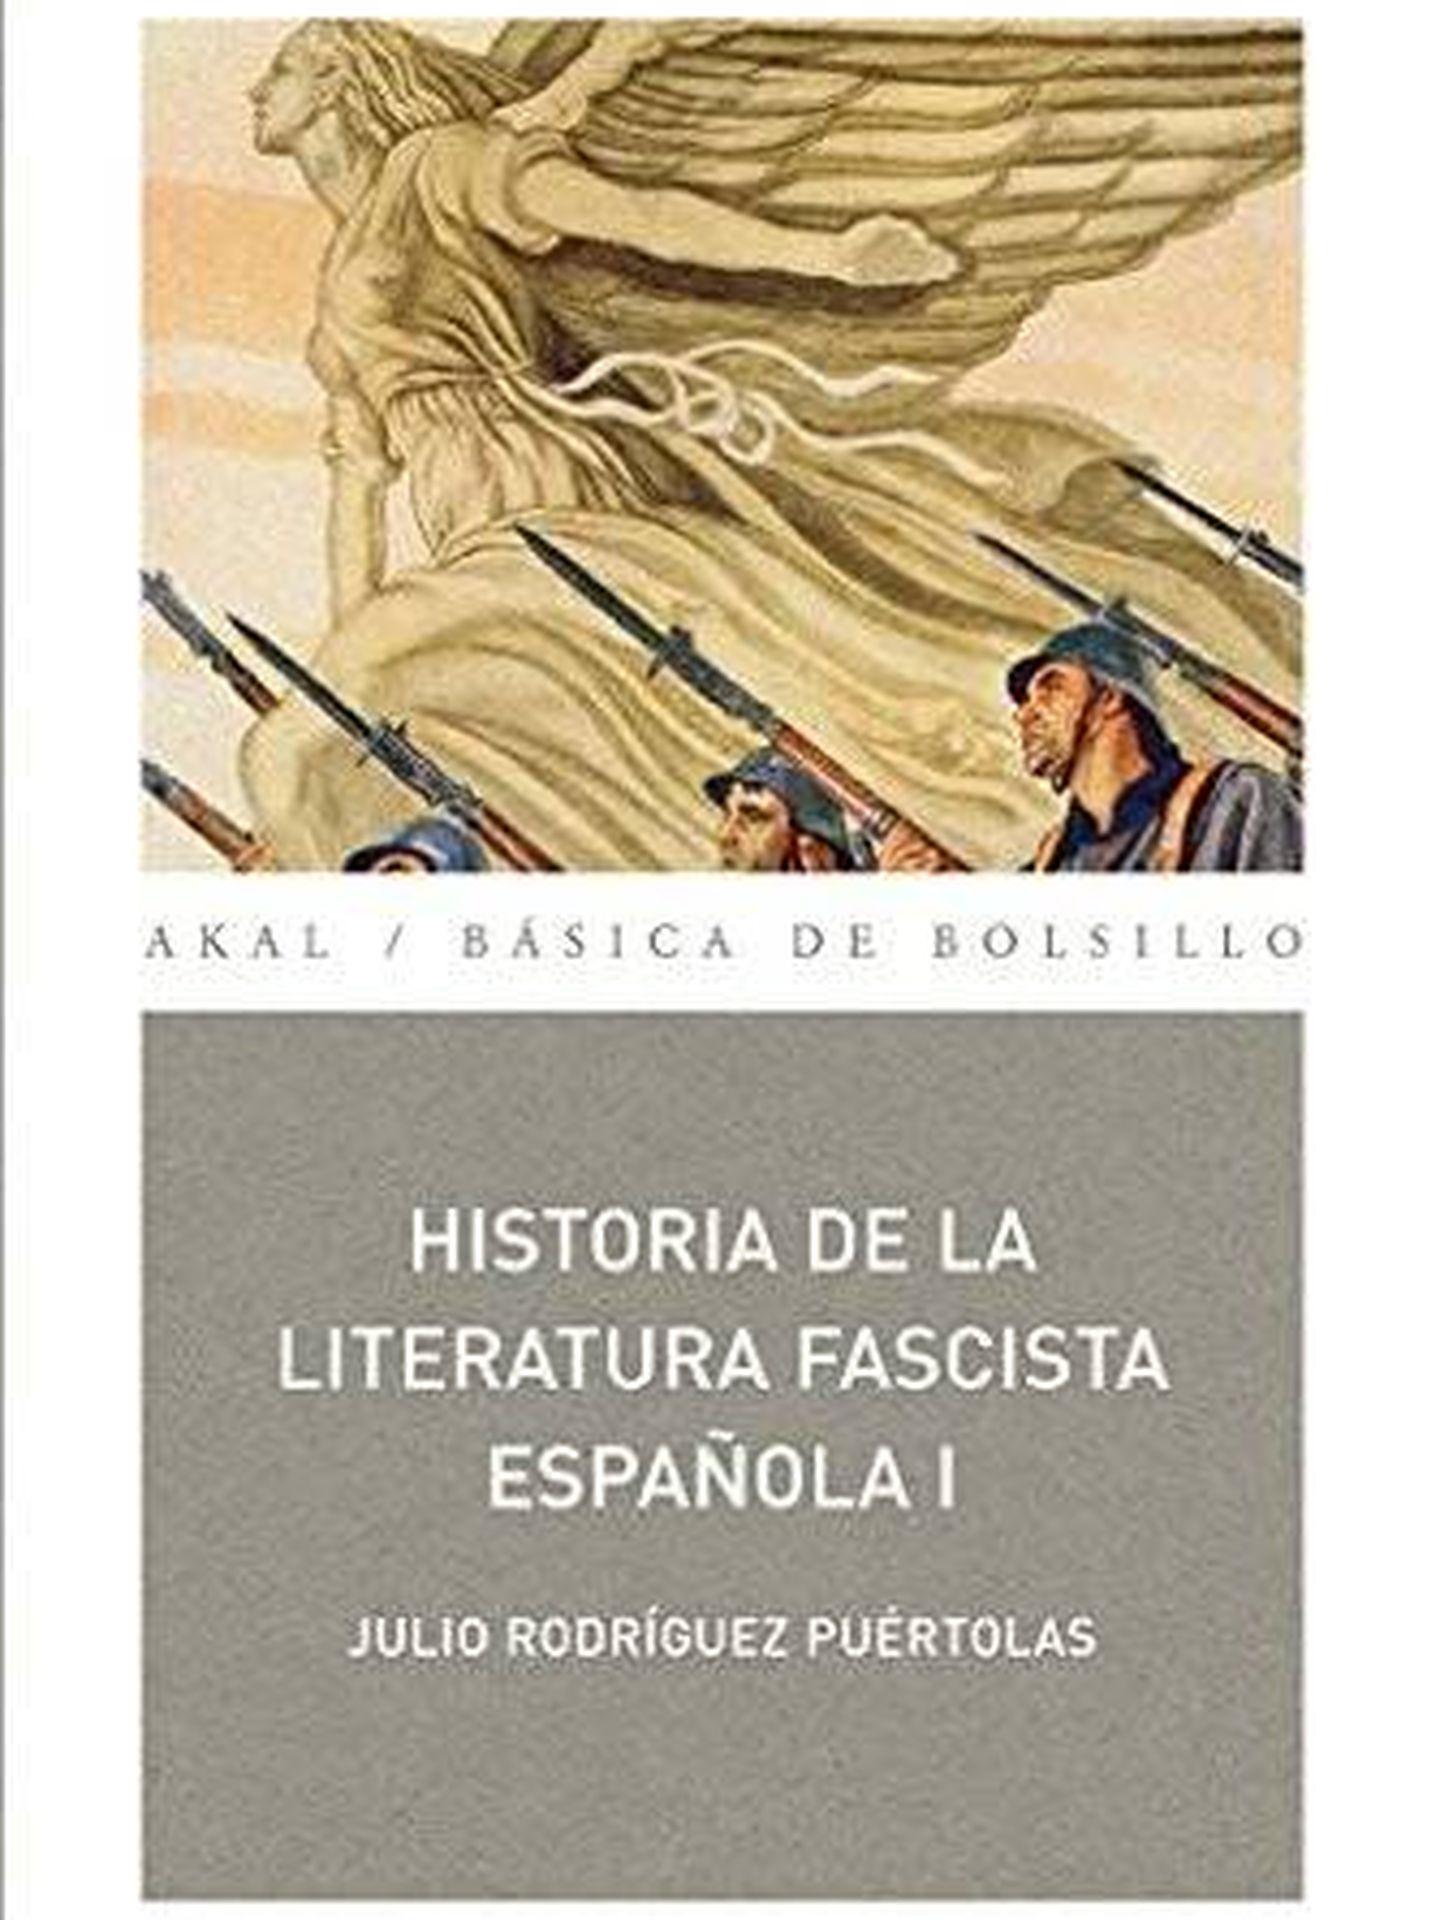 'Historia de la literatura fascista'